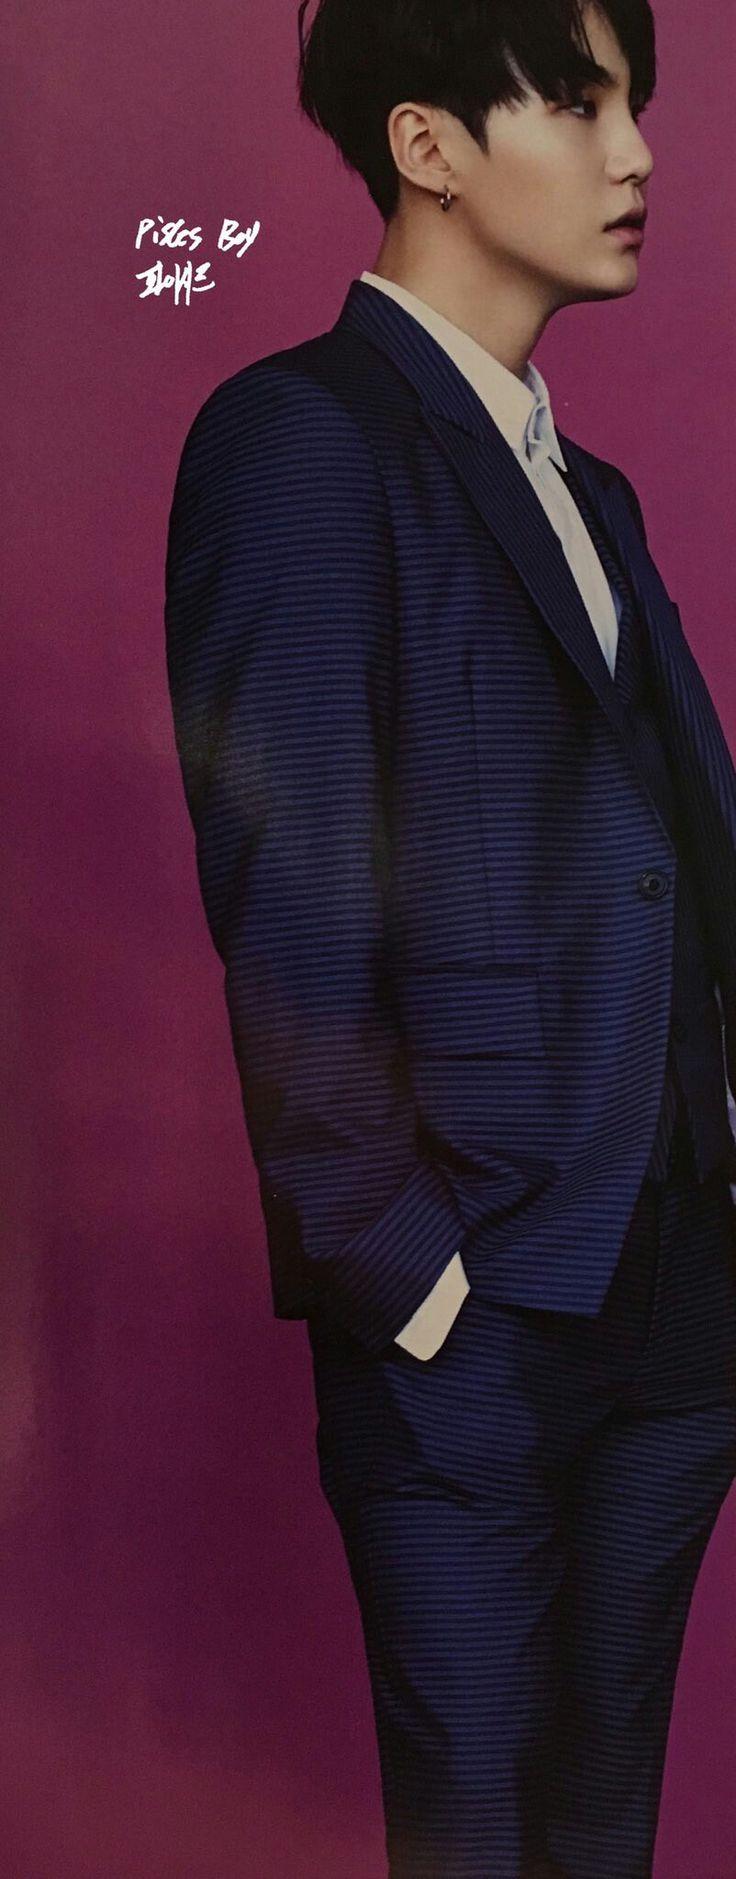 Suga ❤ BTS for Singles Magazine January 2017 Issue #BTS #방탄소년단